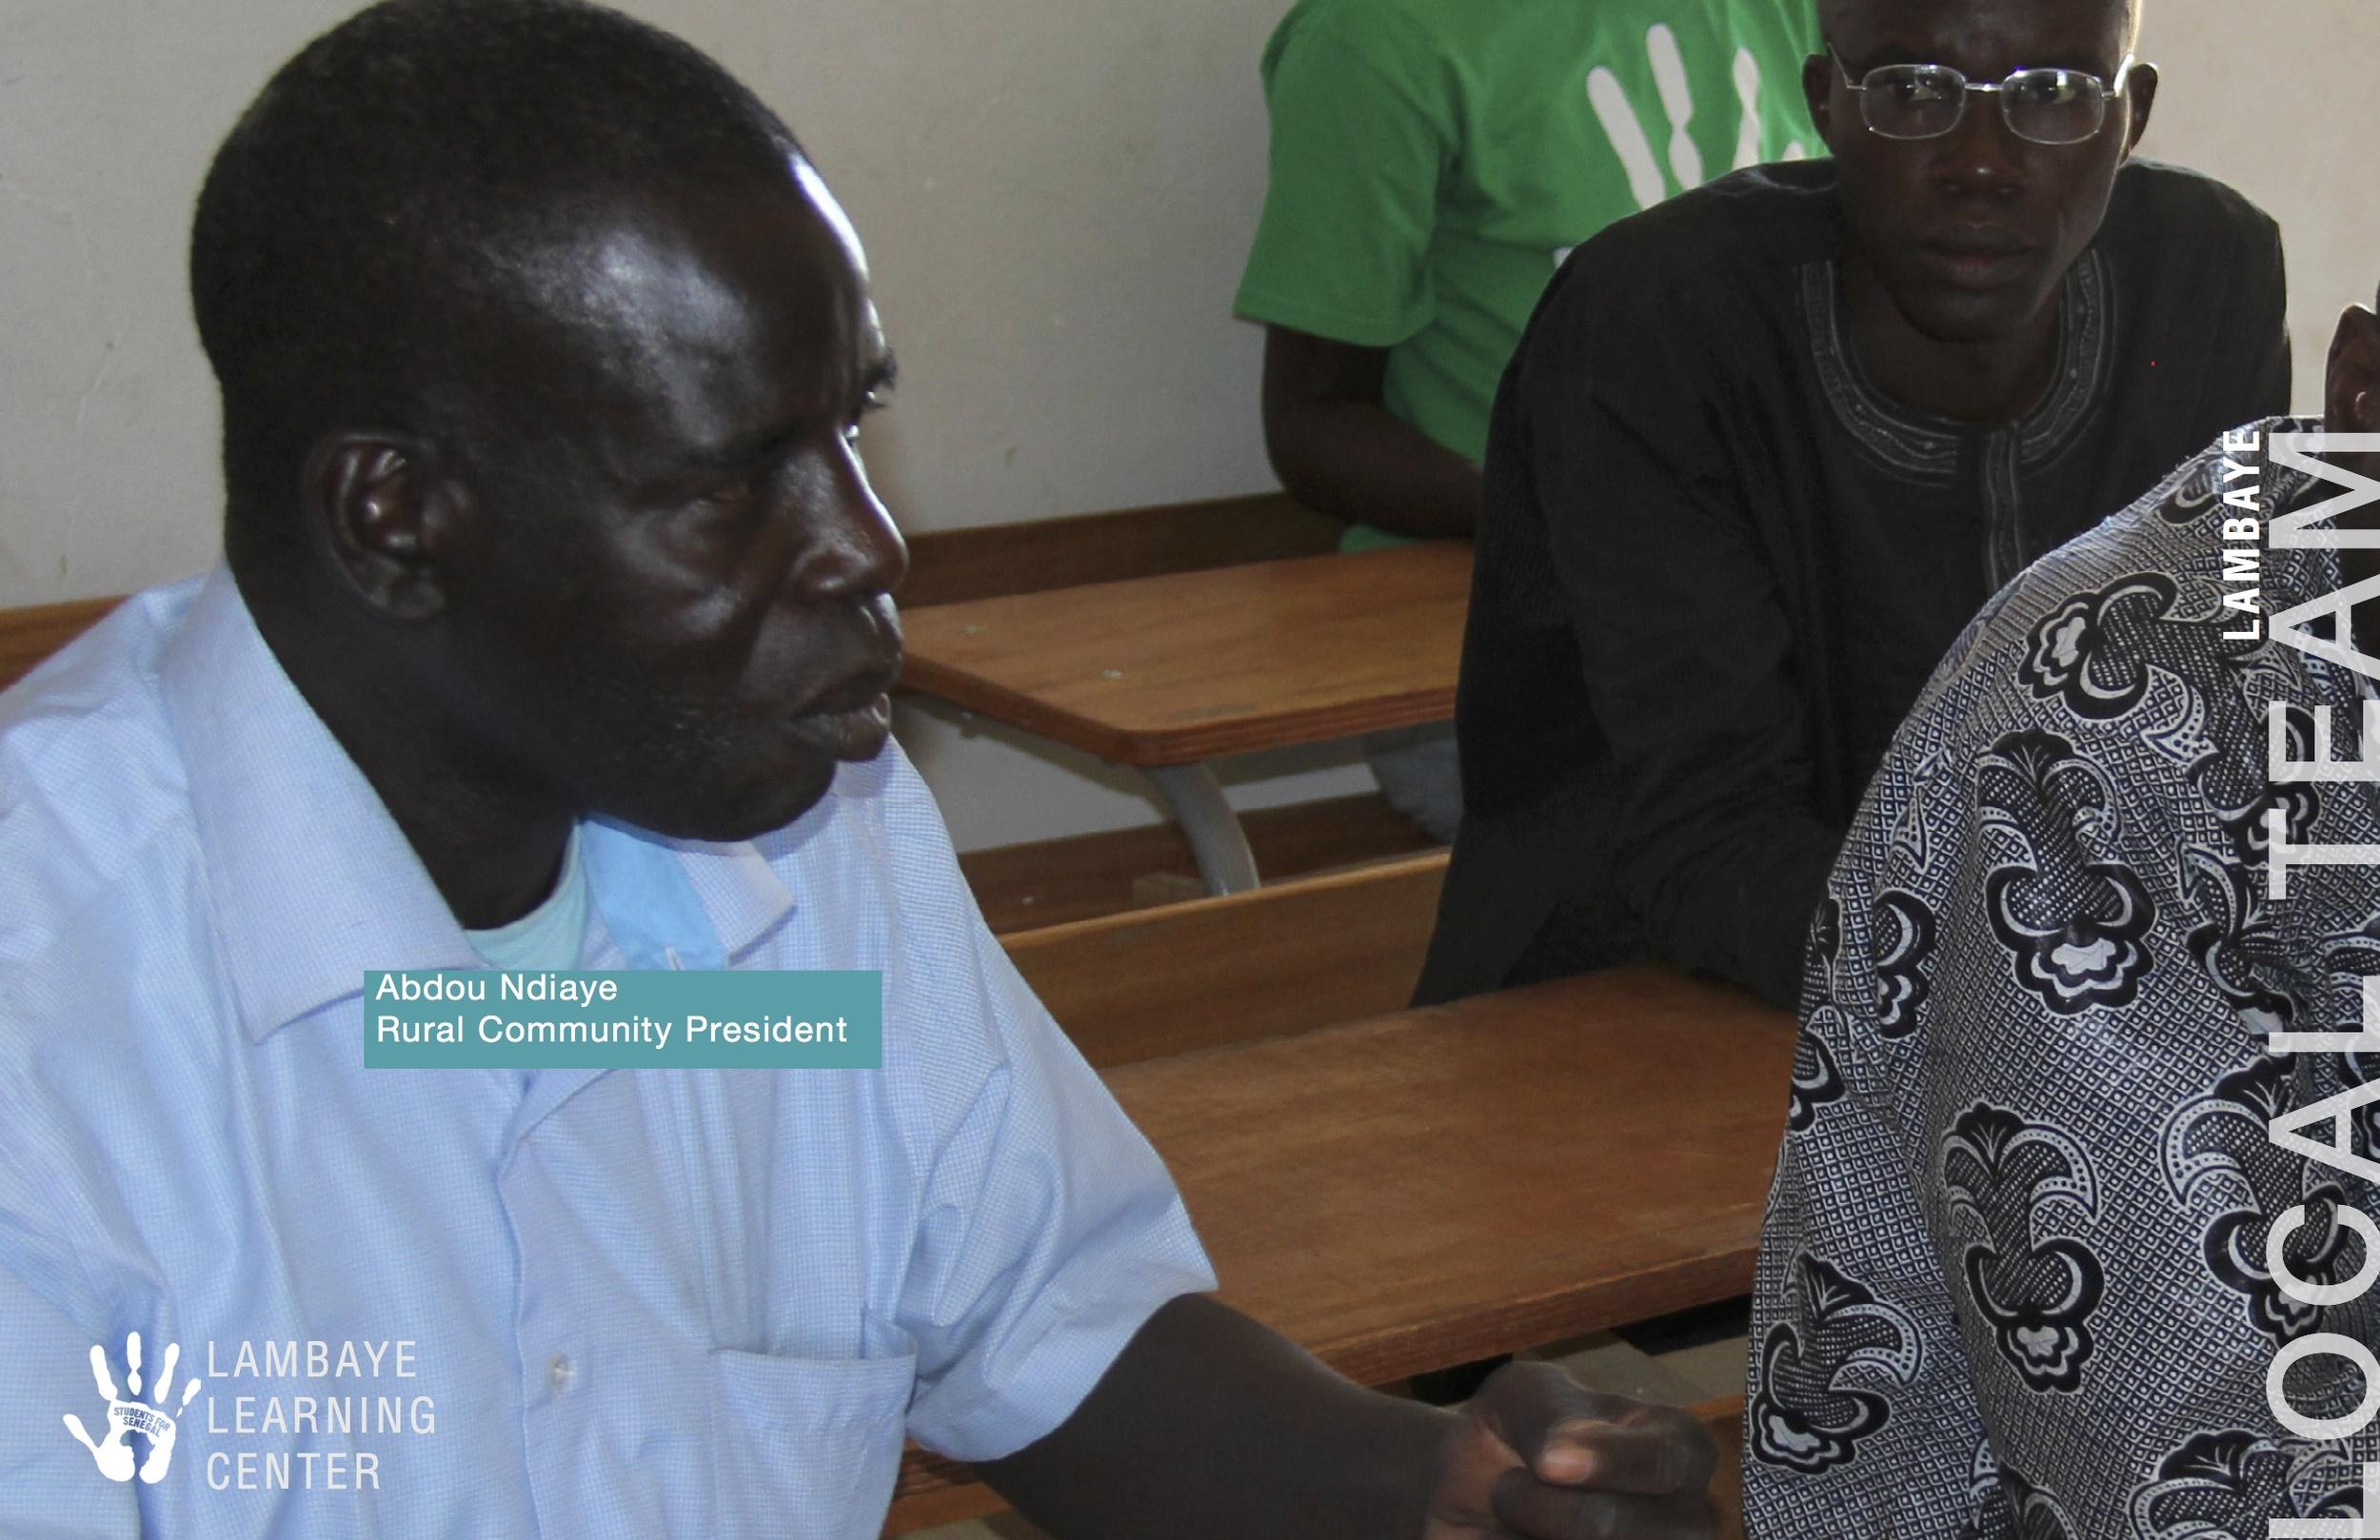 Abdou Ndiaye - Rural Community President